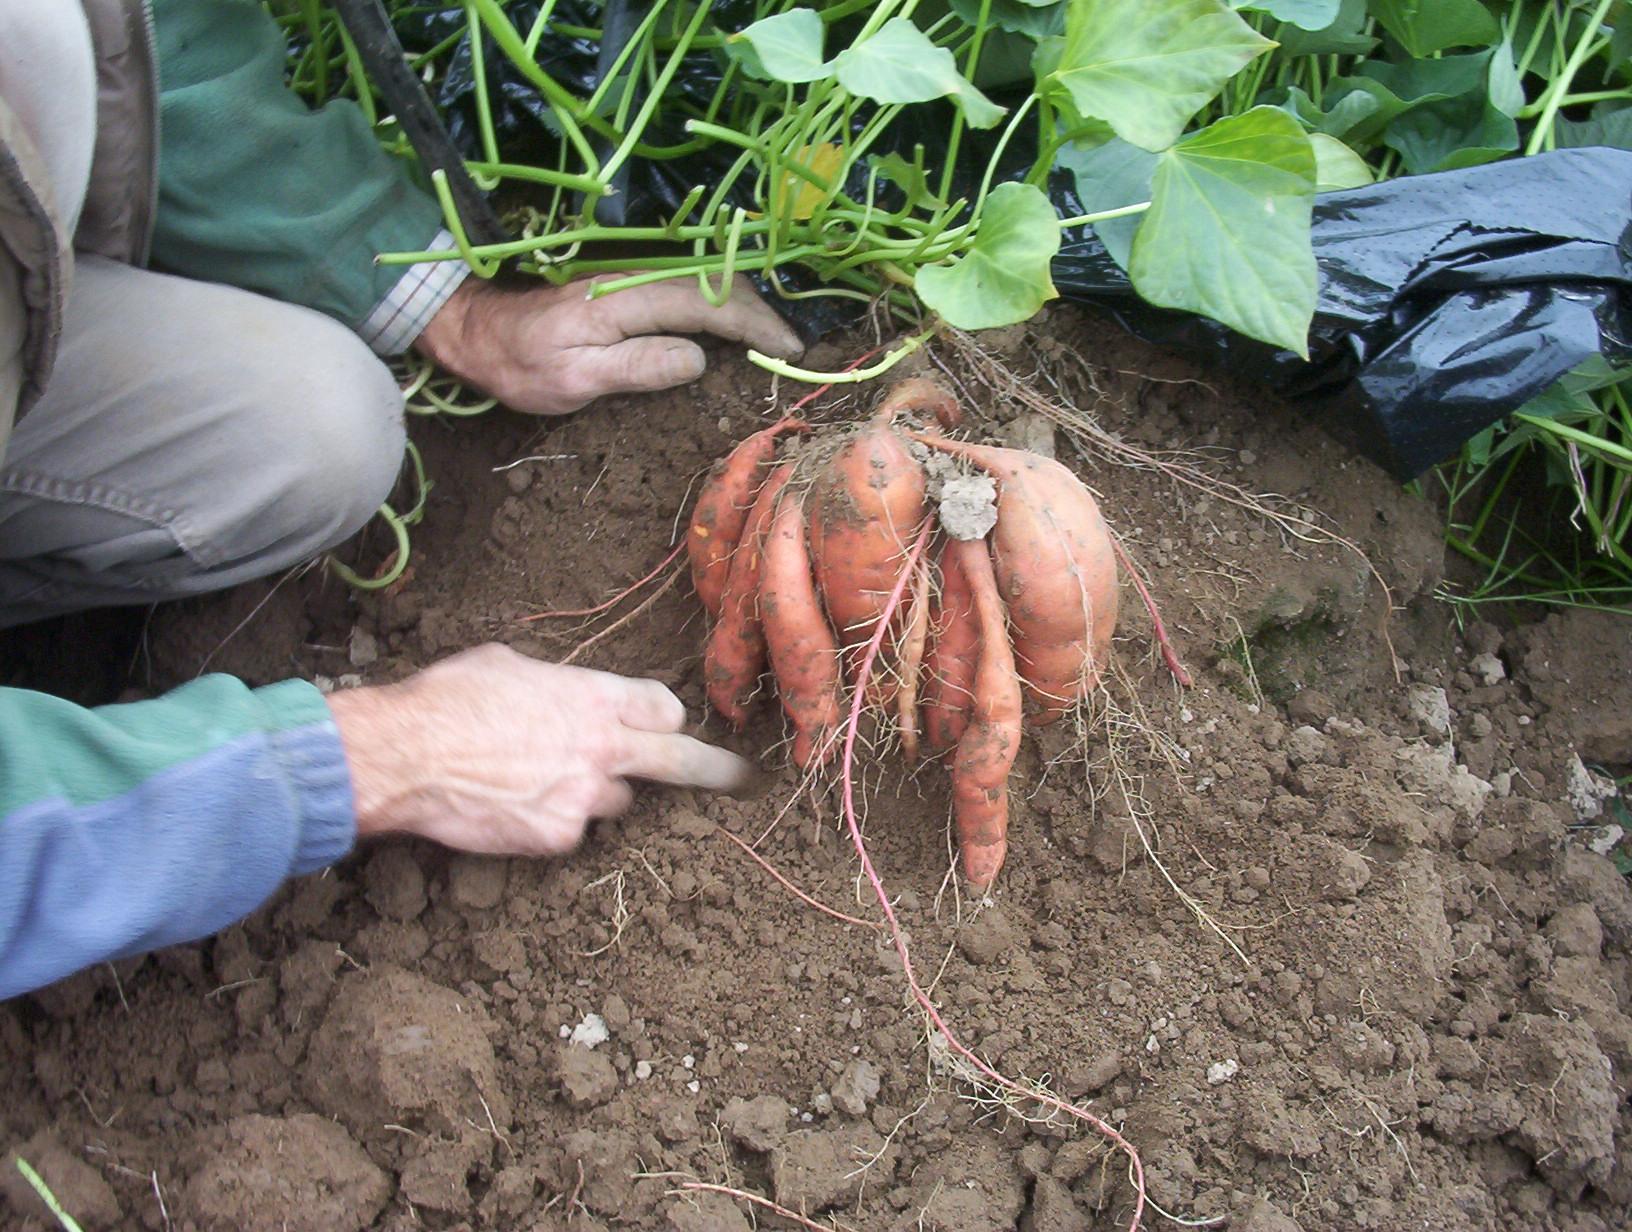 Tubers at harvest